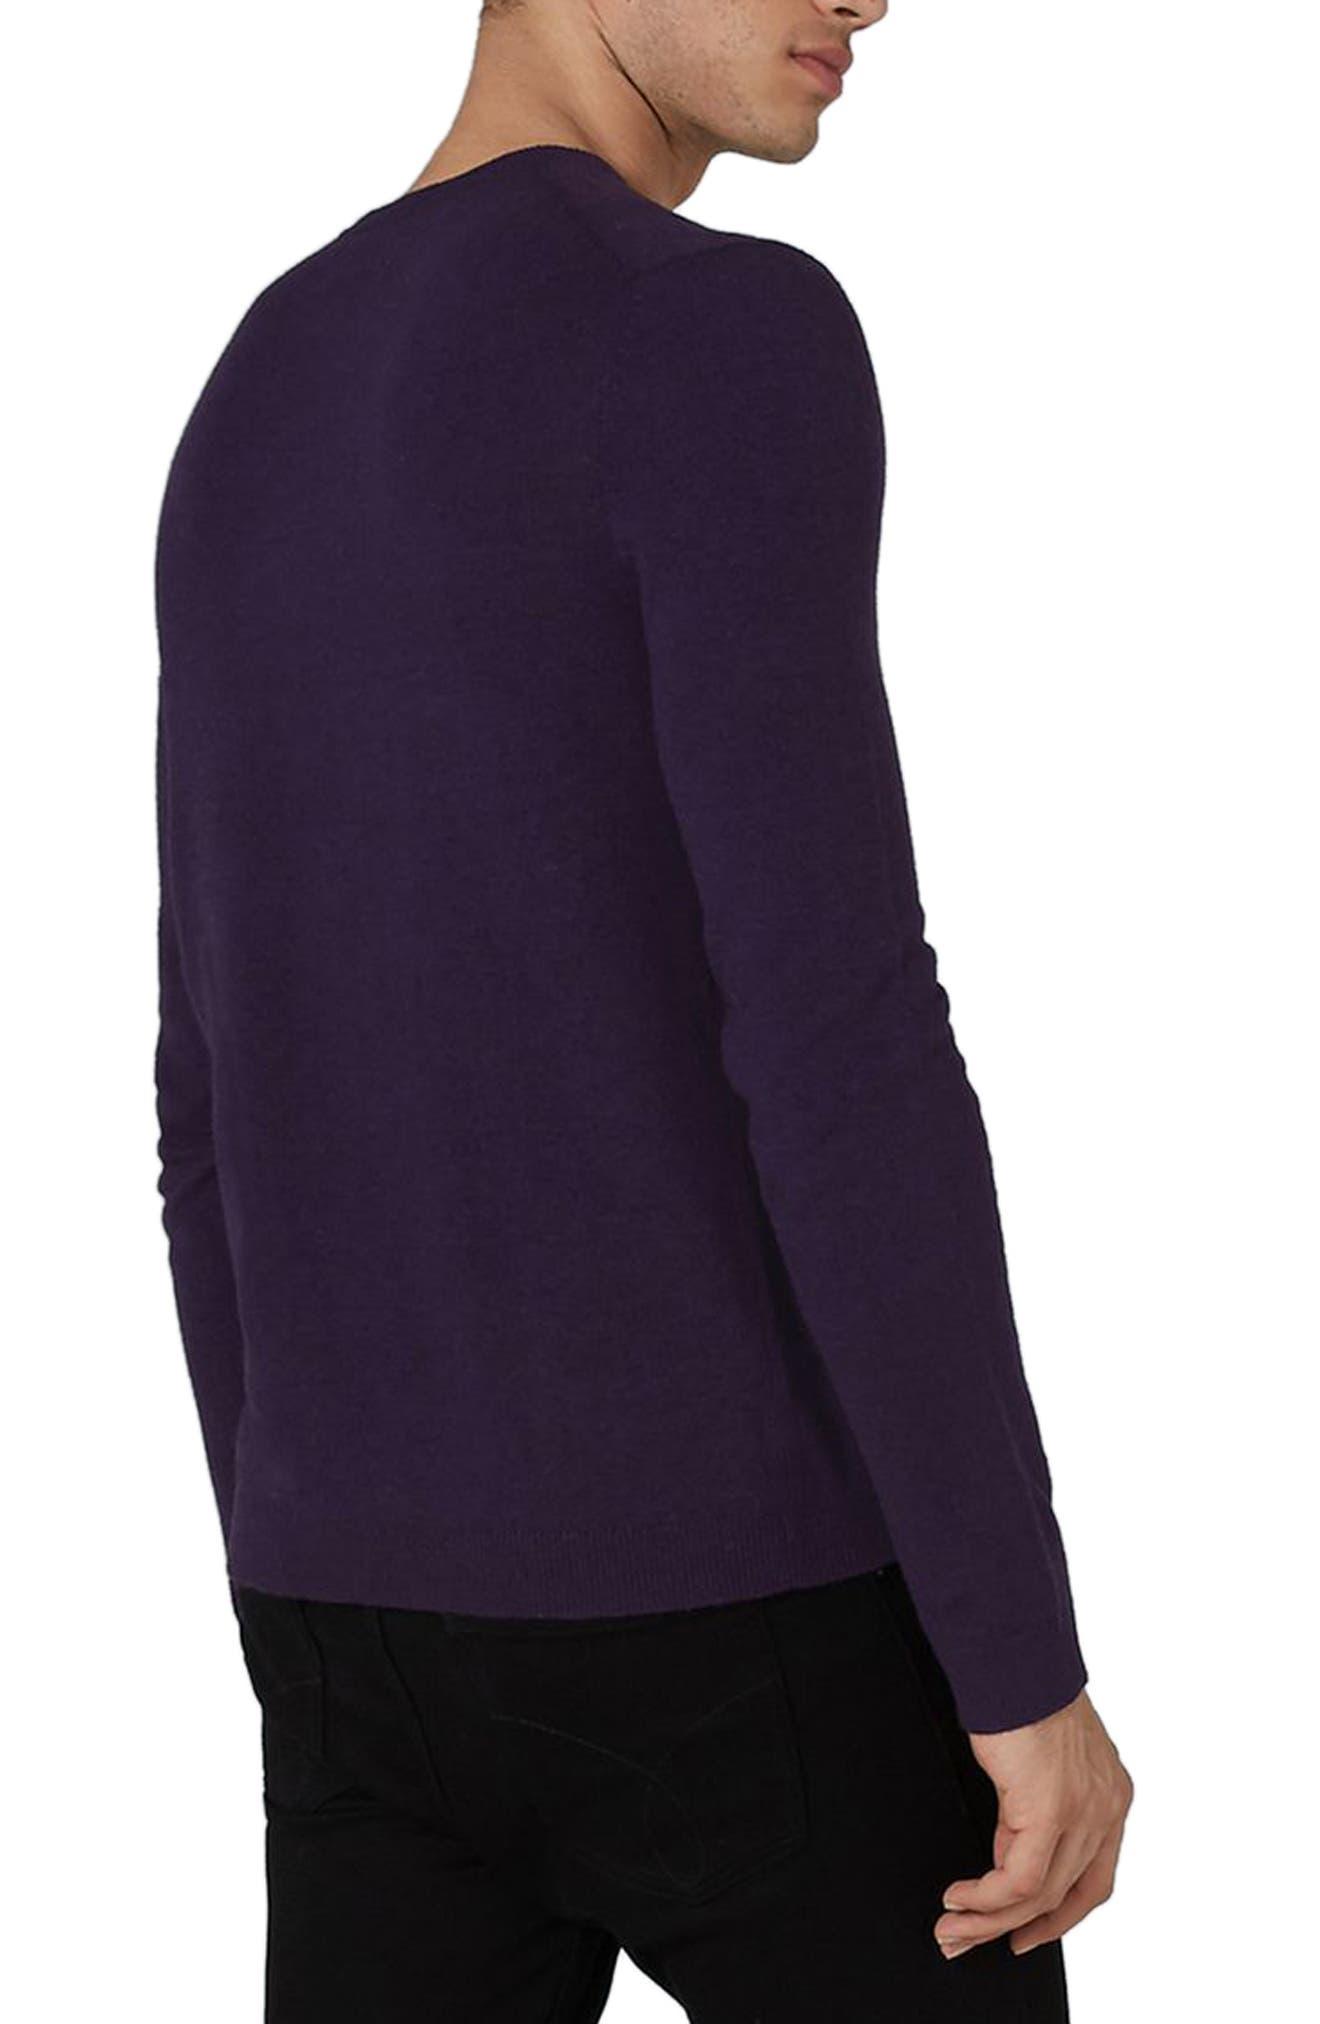 Slim Fit Crewneck Sweater,                             Alternate thumbnail 2, color,                             Dark Purple